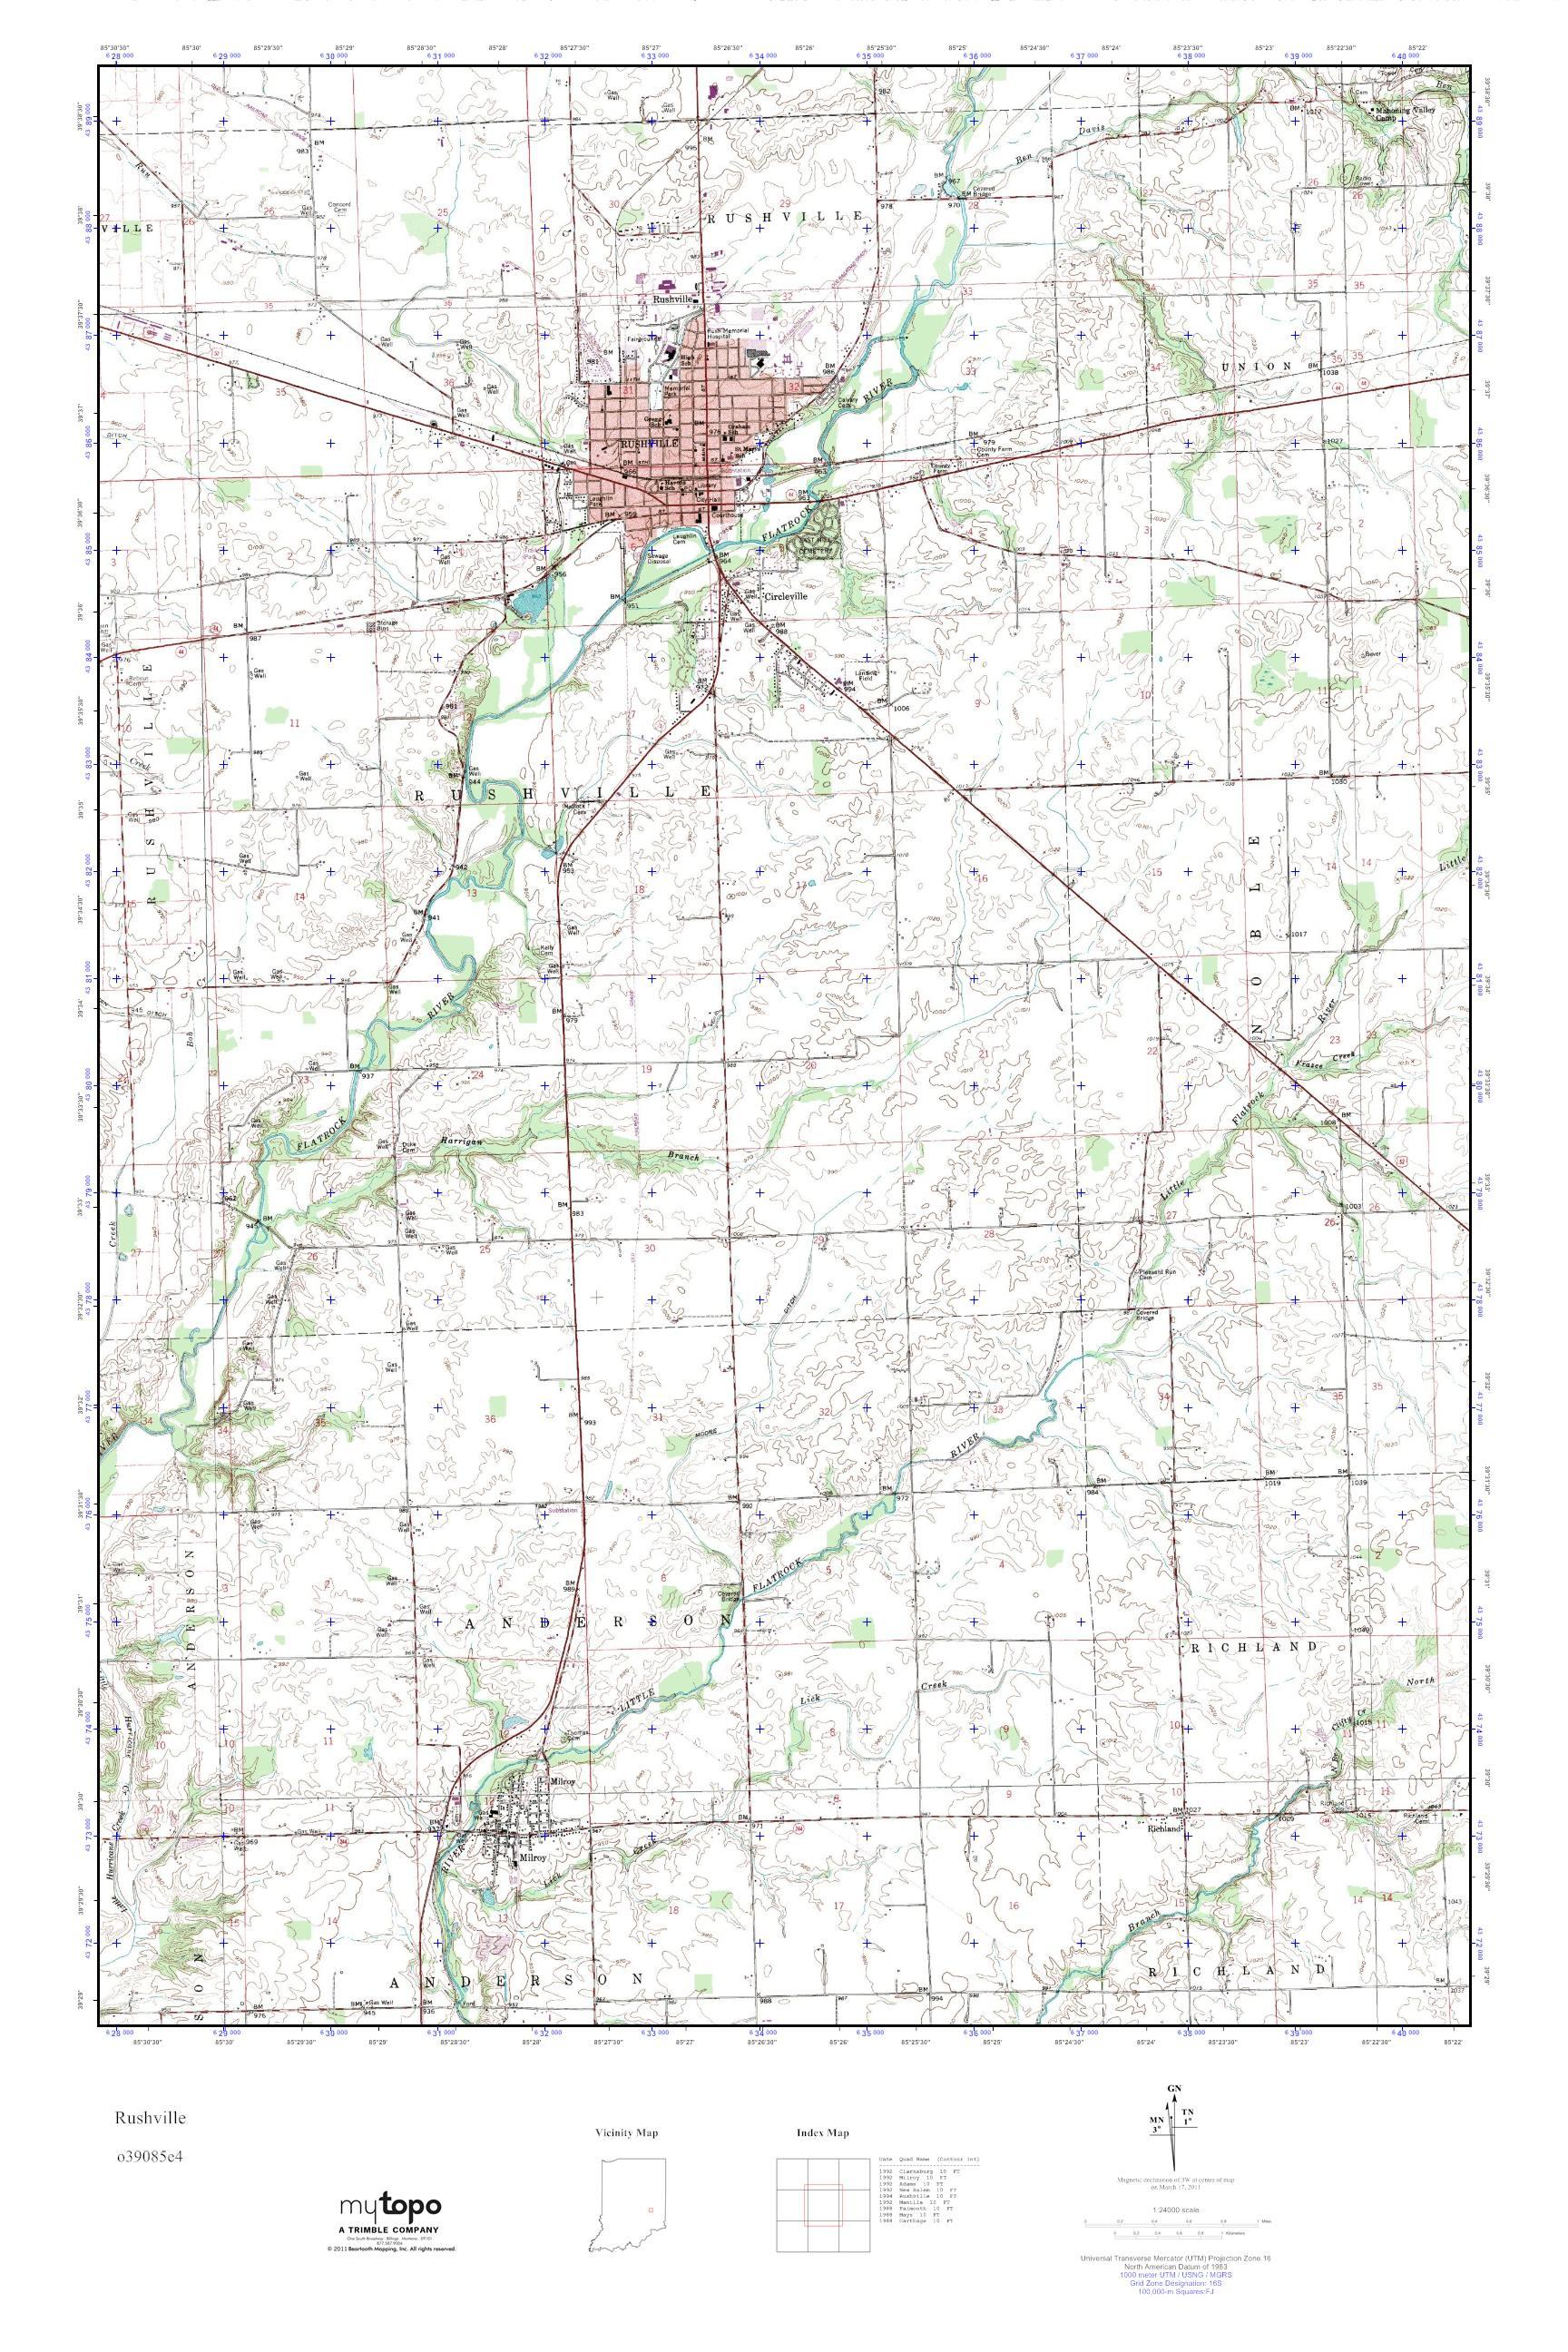 Mytopo Rushville Indiana Usgs Quad Topo Map